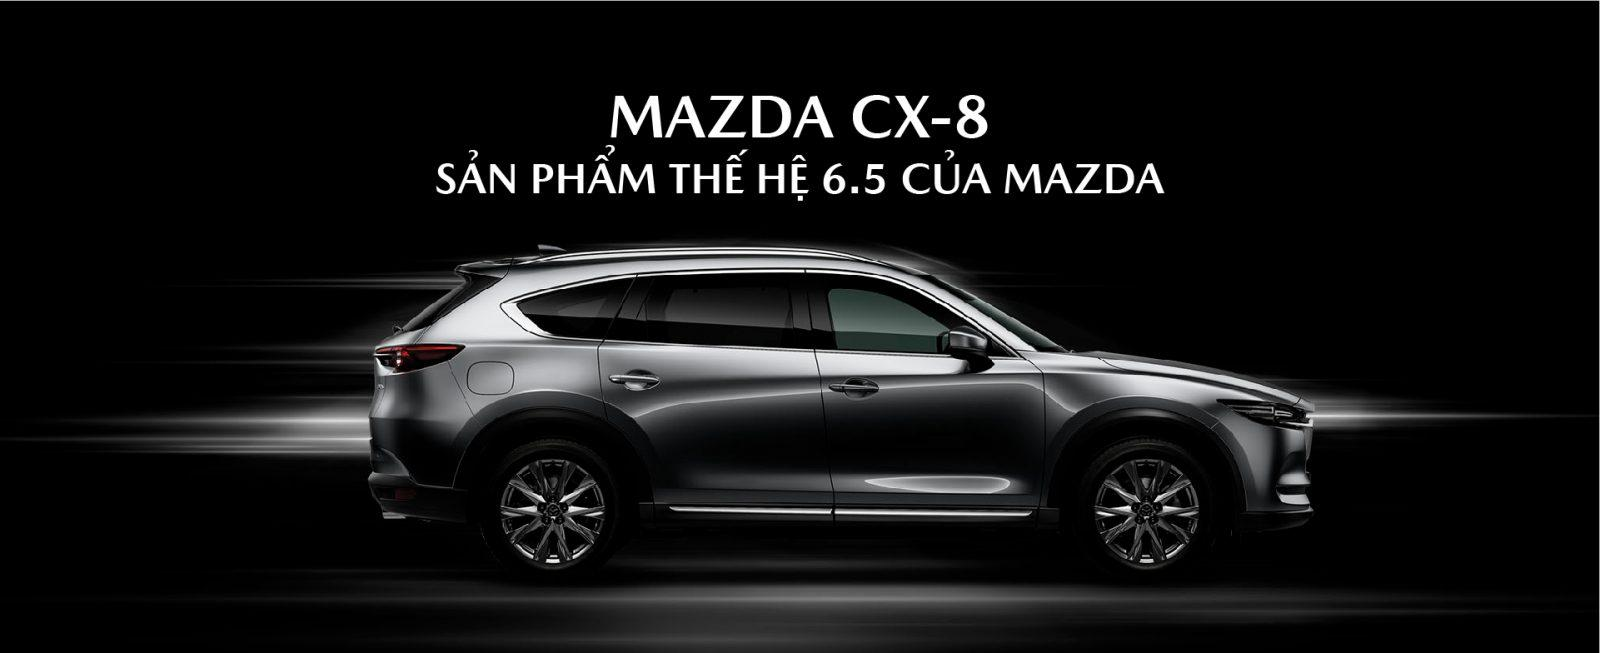 Mazda-cx-8-san-pham-the-he-6.5-cua-Mazda